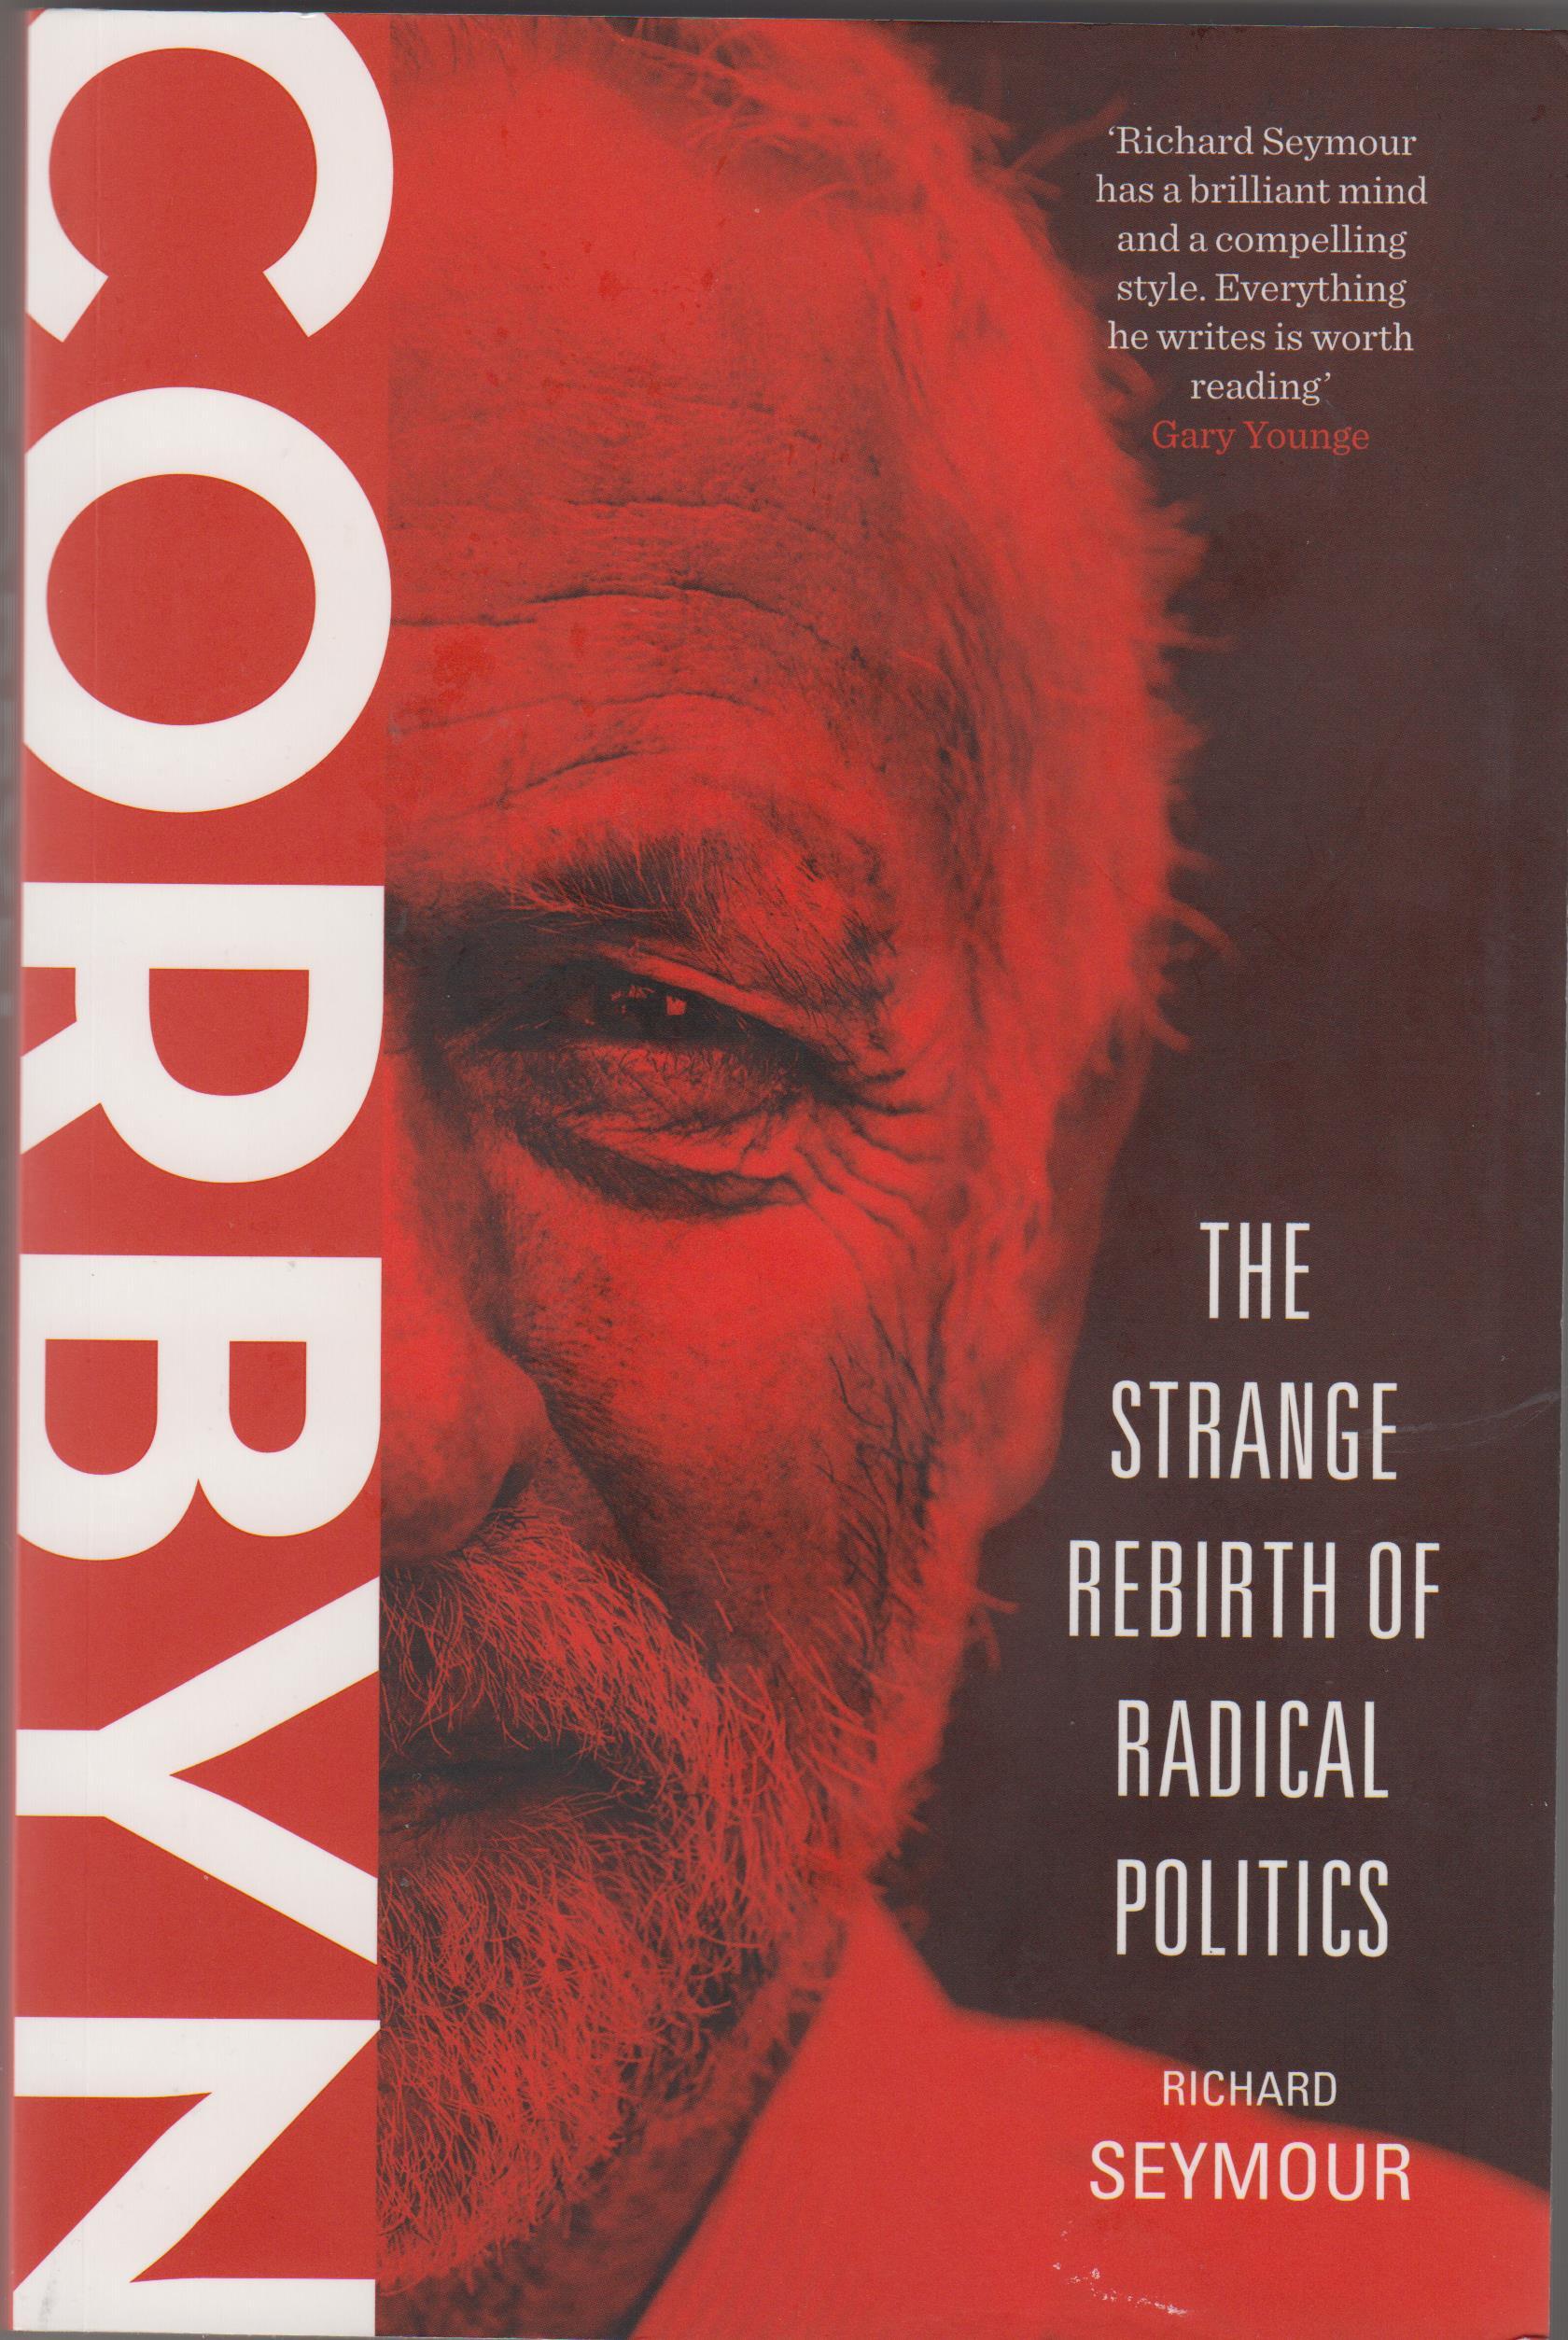 seymour-corbyn-book.jpeg